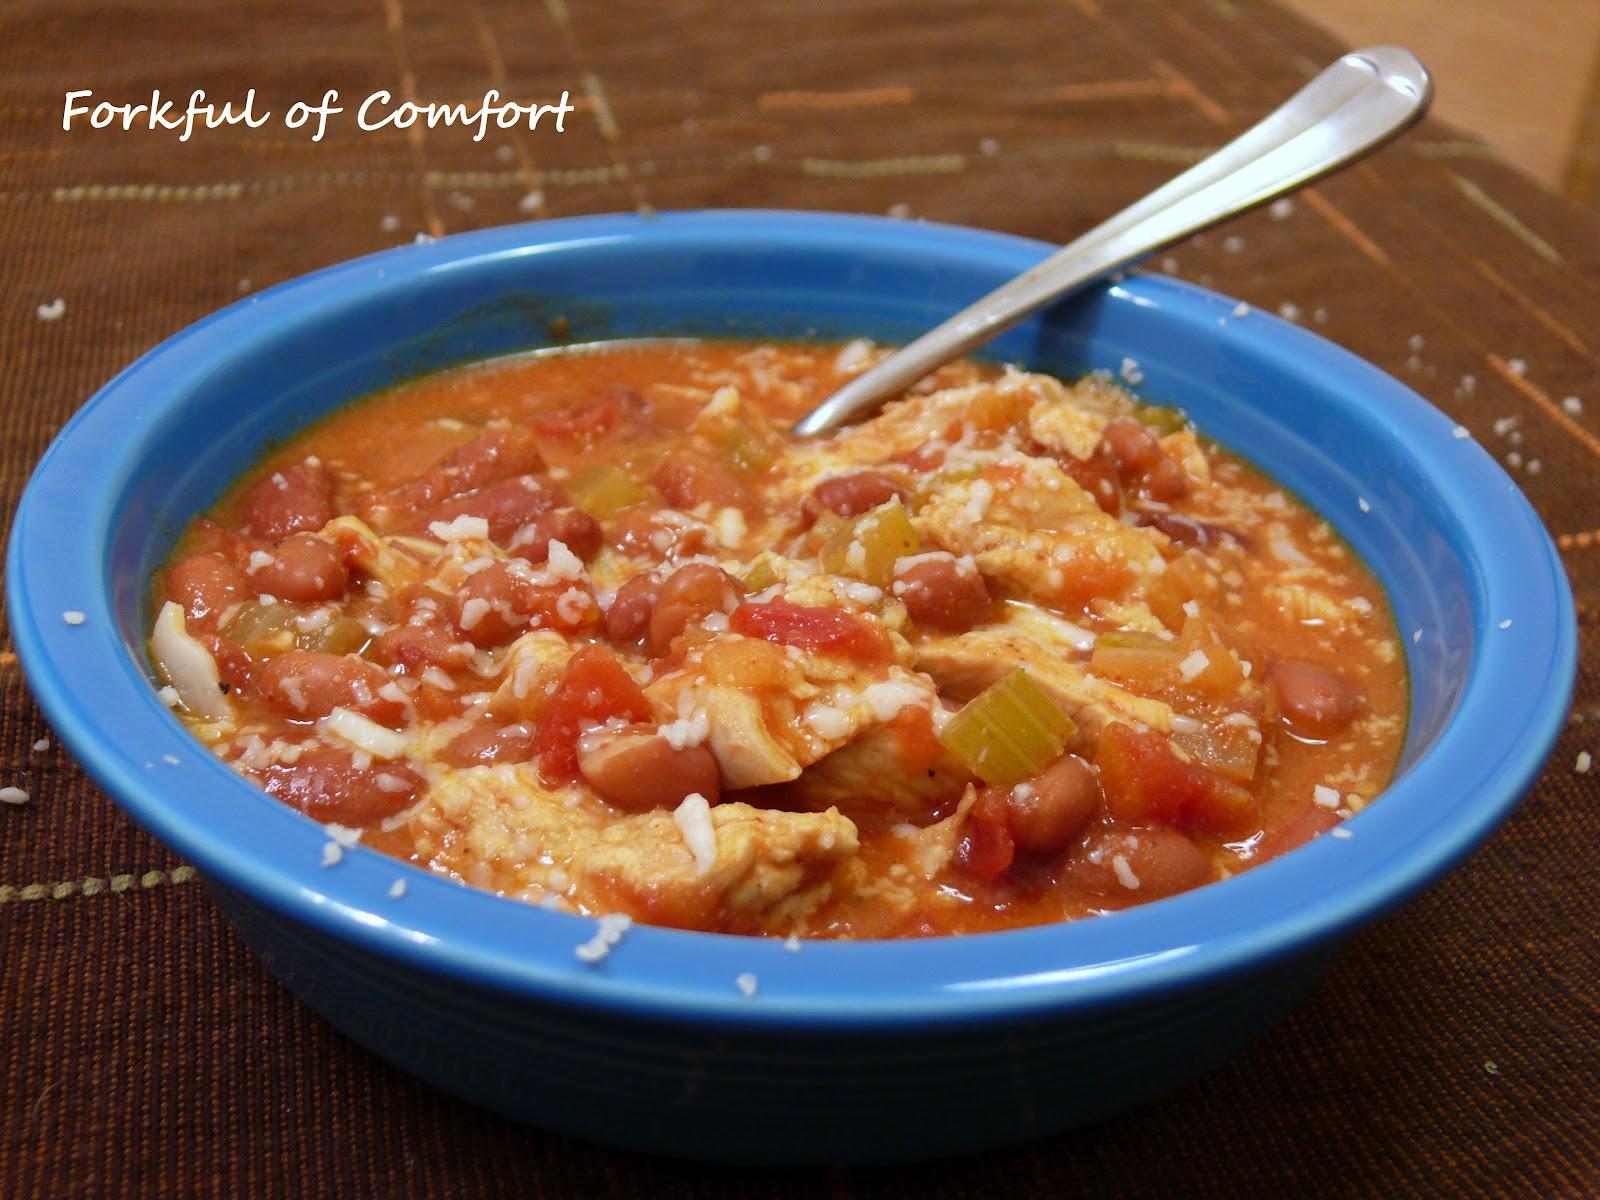 Forkful of Comfort: Buffalo Chicken Chili